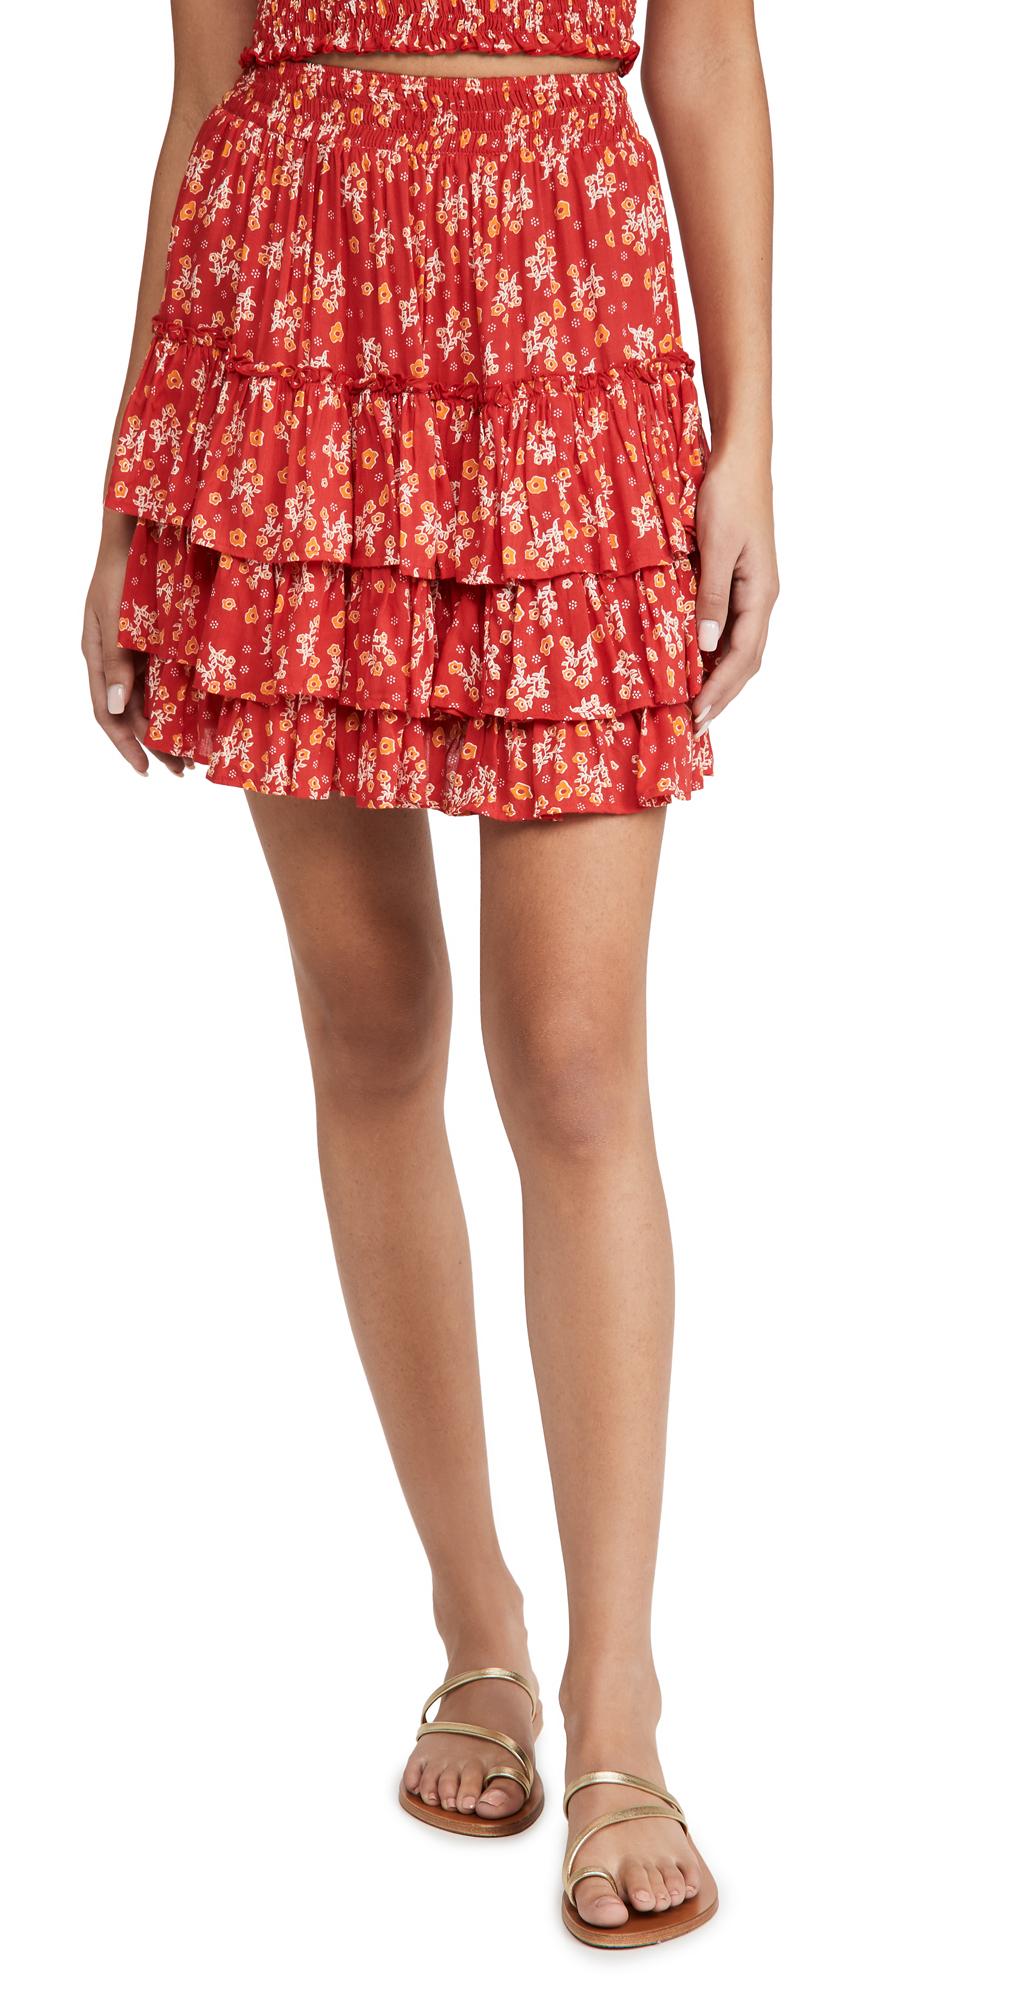 coolchange Penelope Skirt